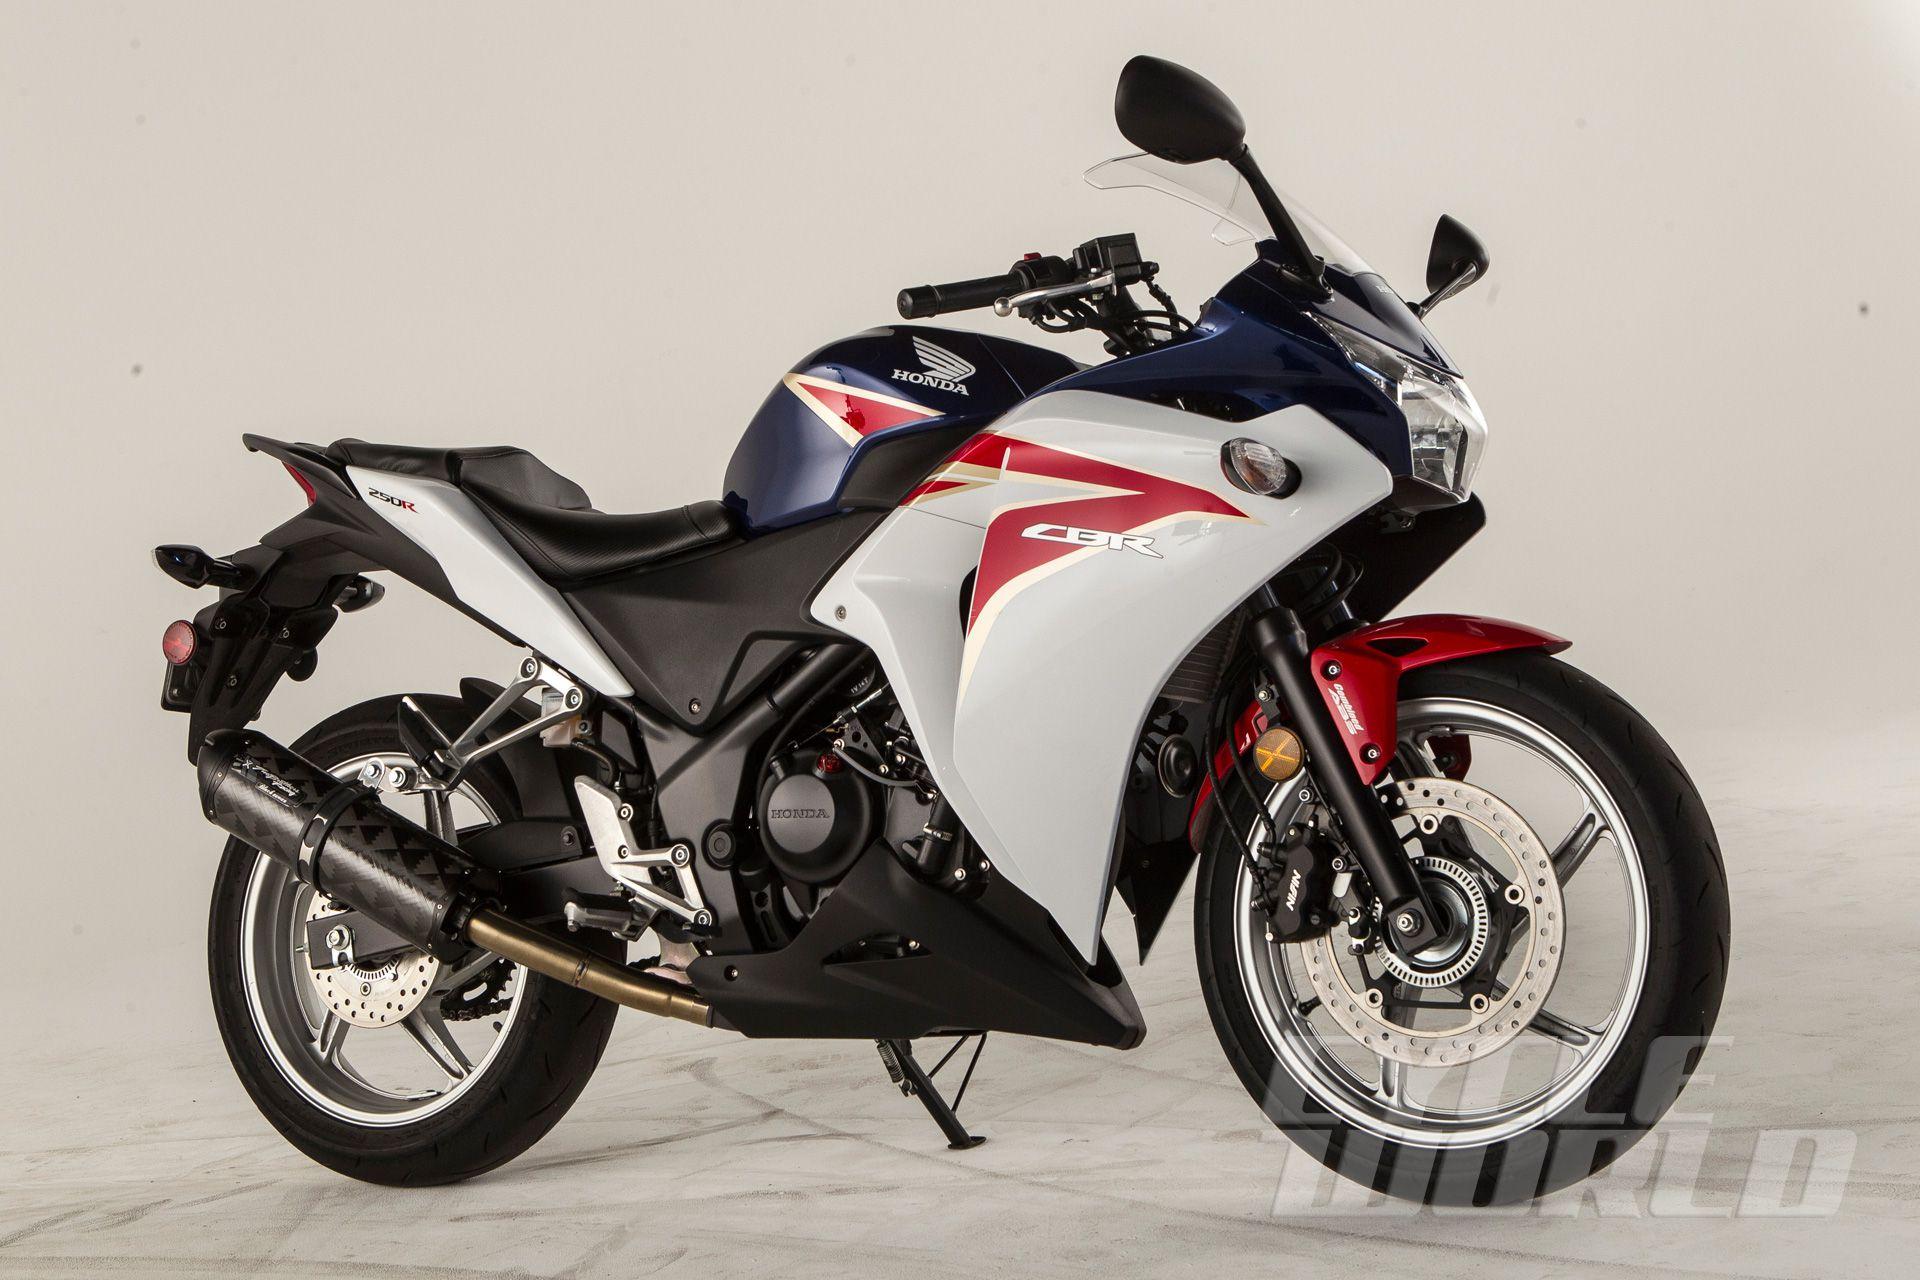 Honda CBR250R ABS- Long-Term Test Wrap-Up | Cycle World